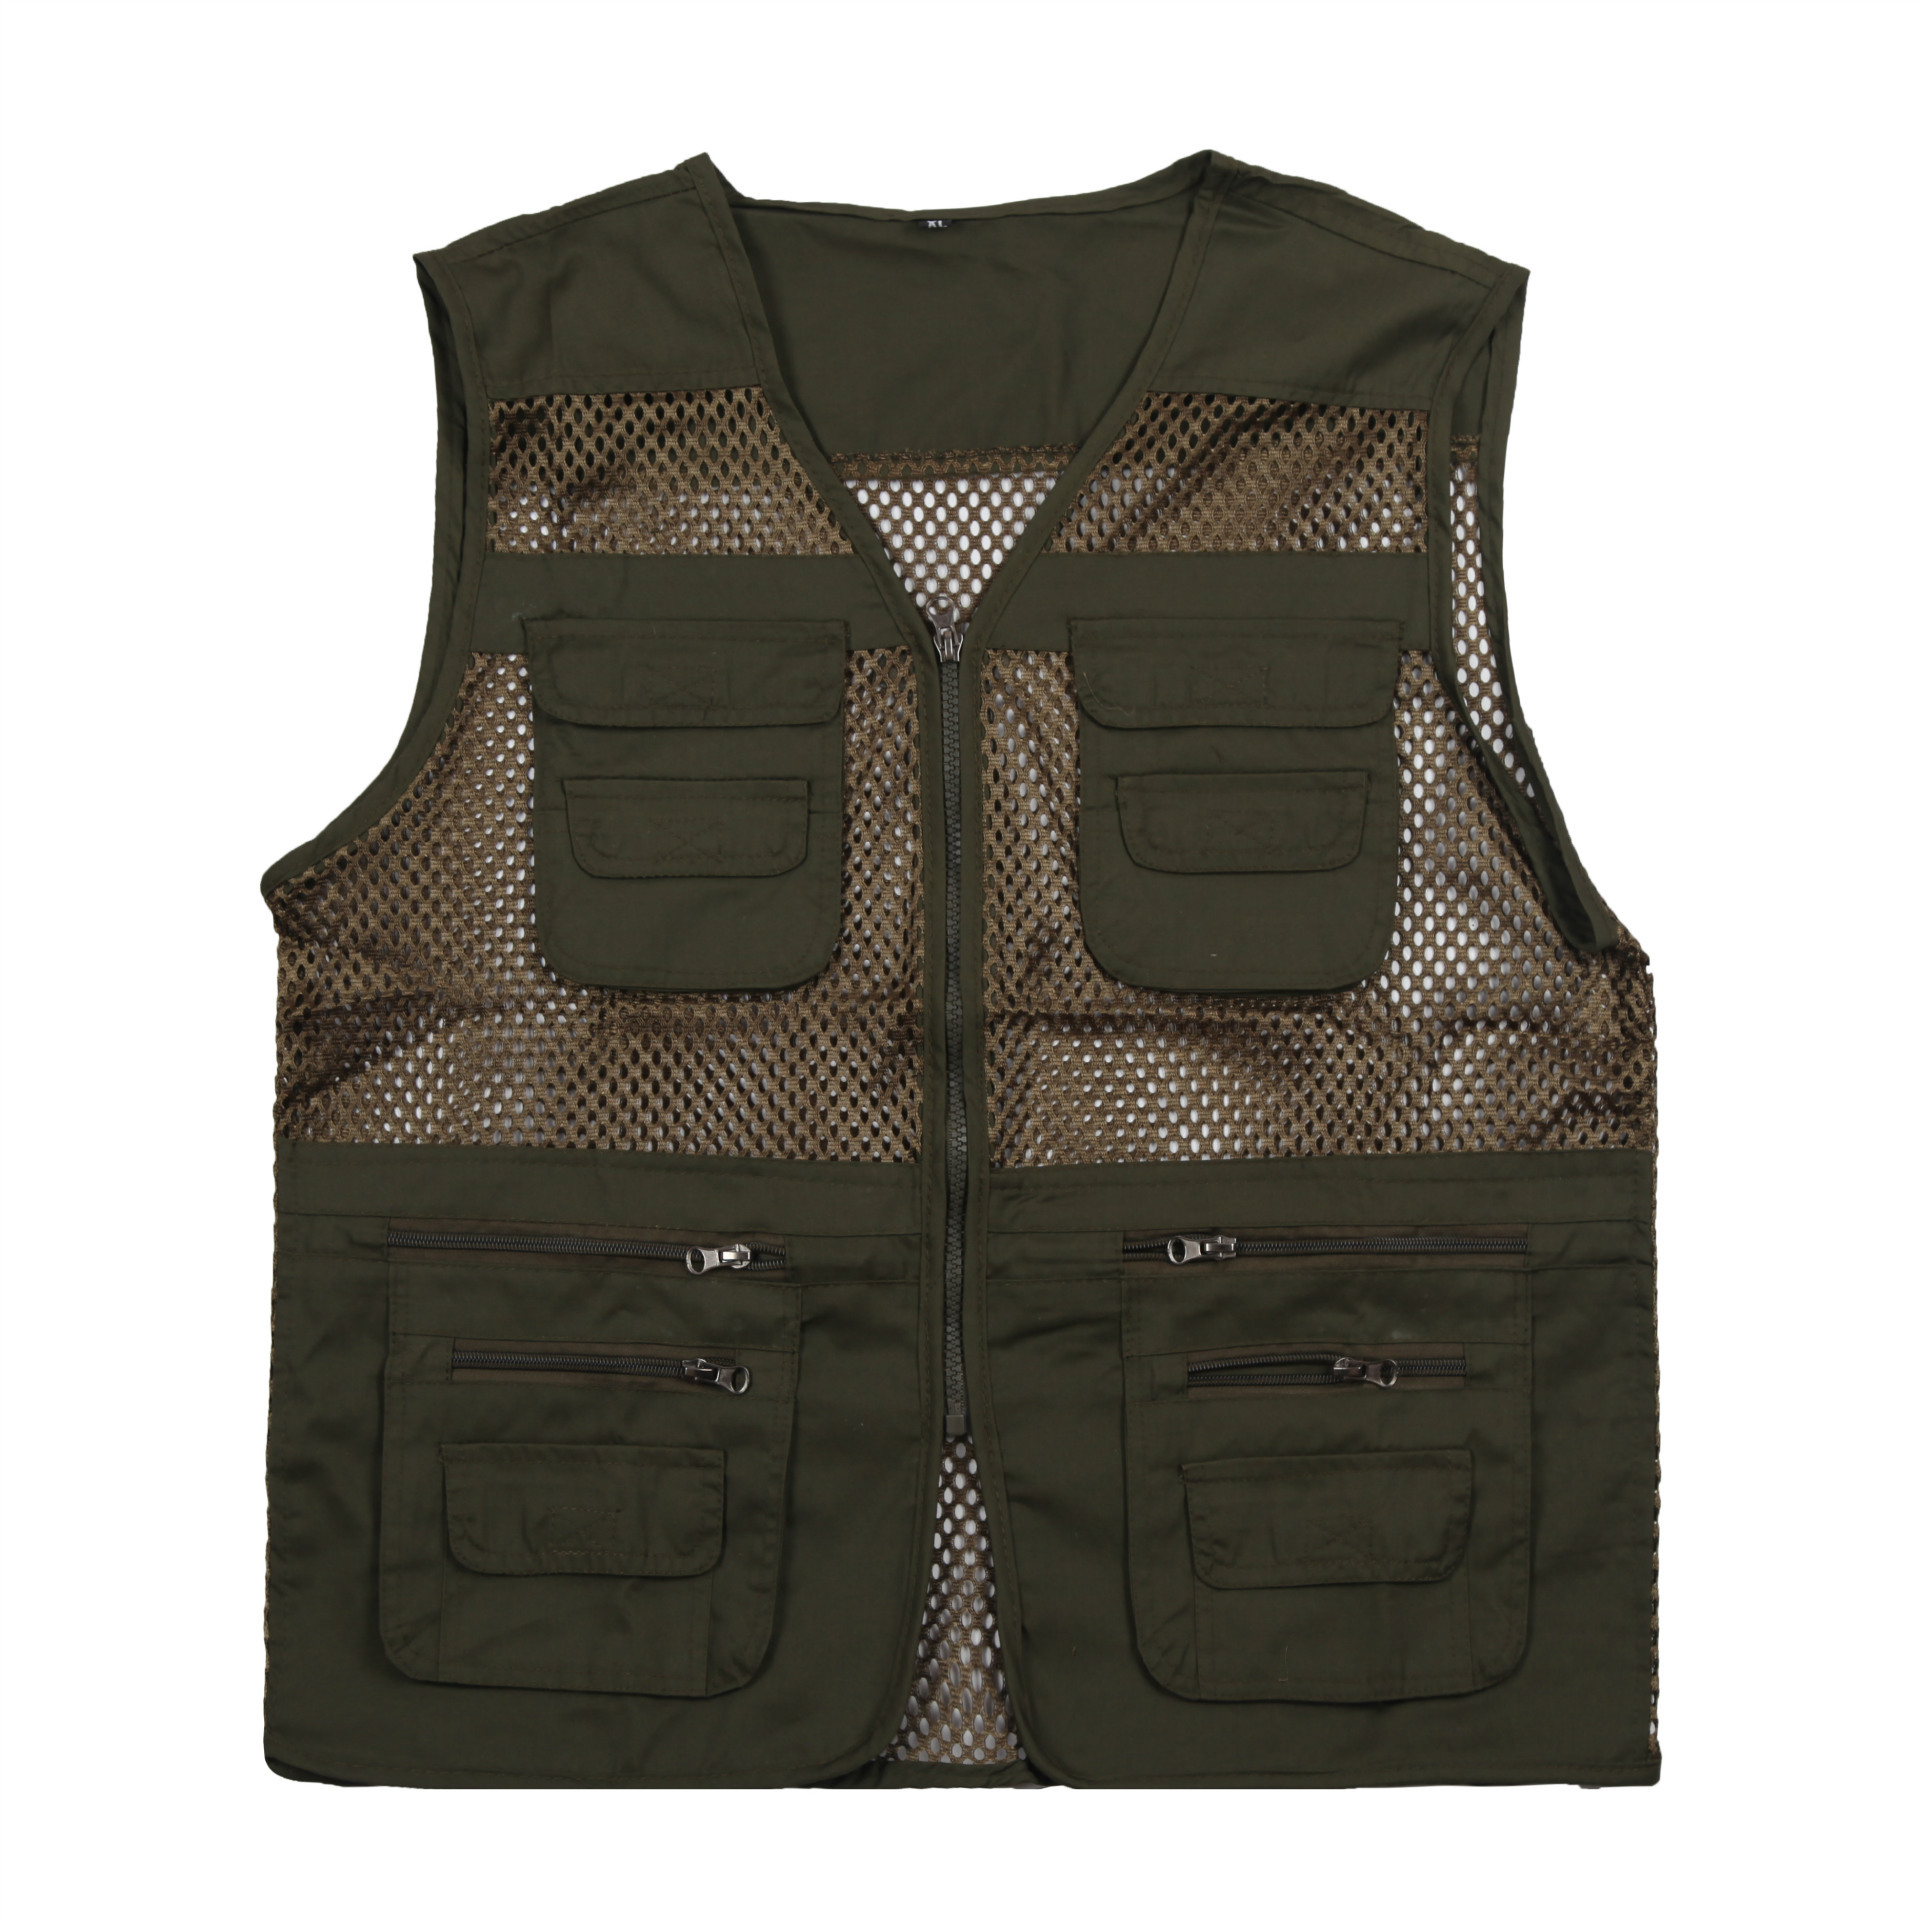 Fishing Vest Summer Outdoor Men Hiking Multi Pocket Waistcoat Photography Jacket